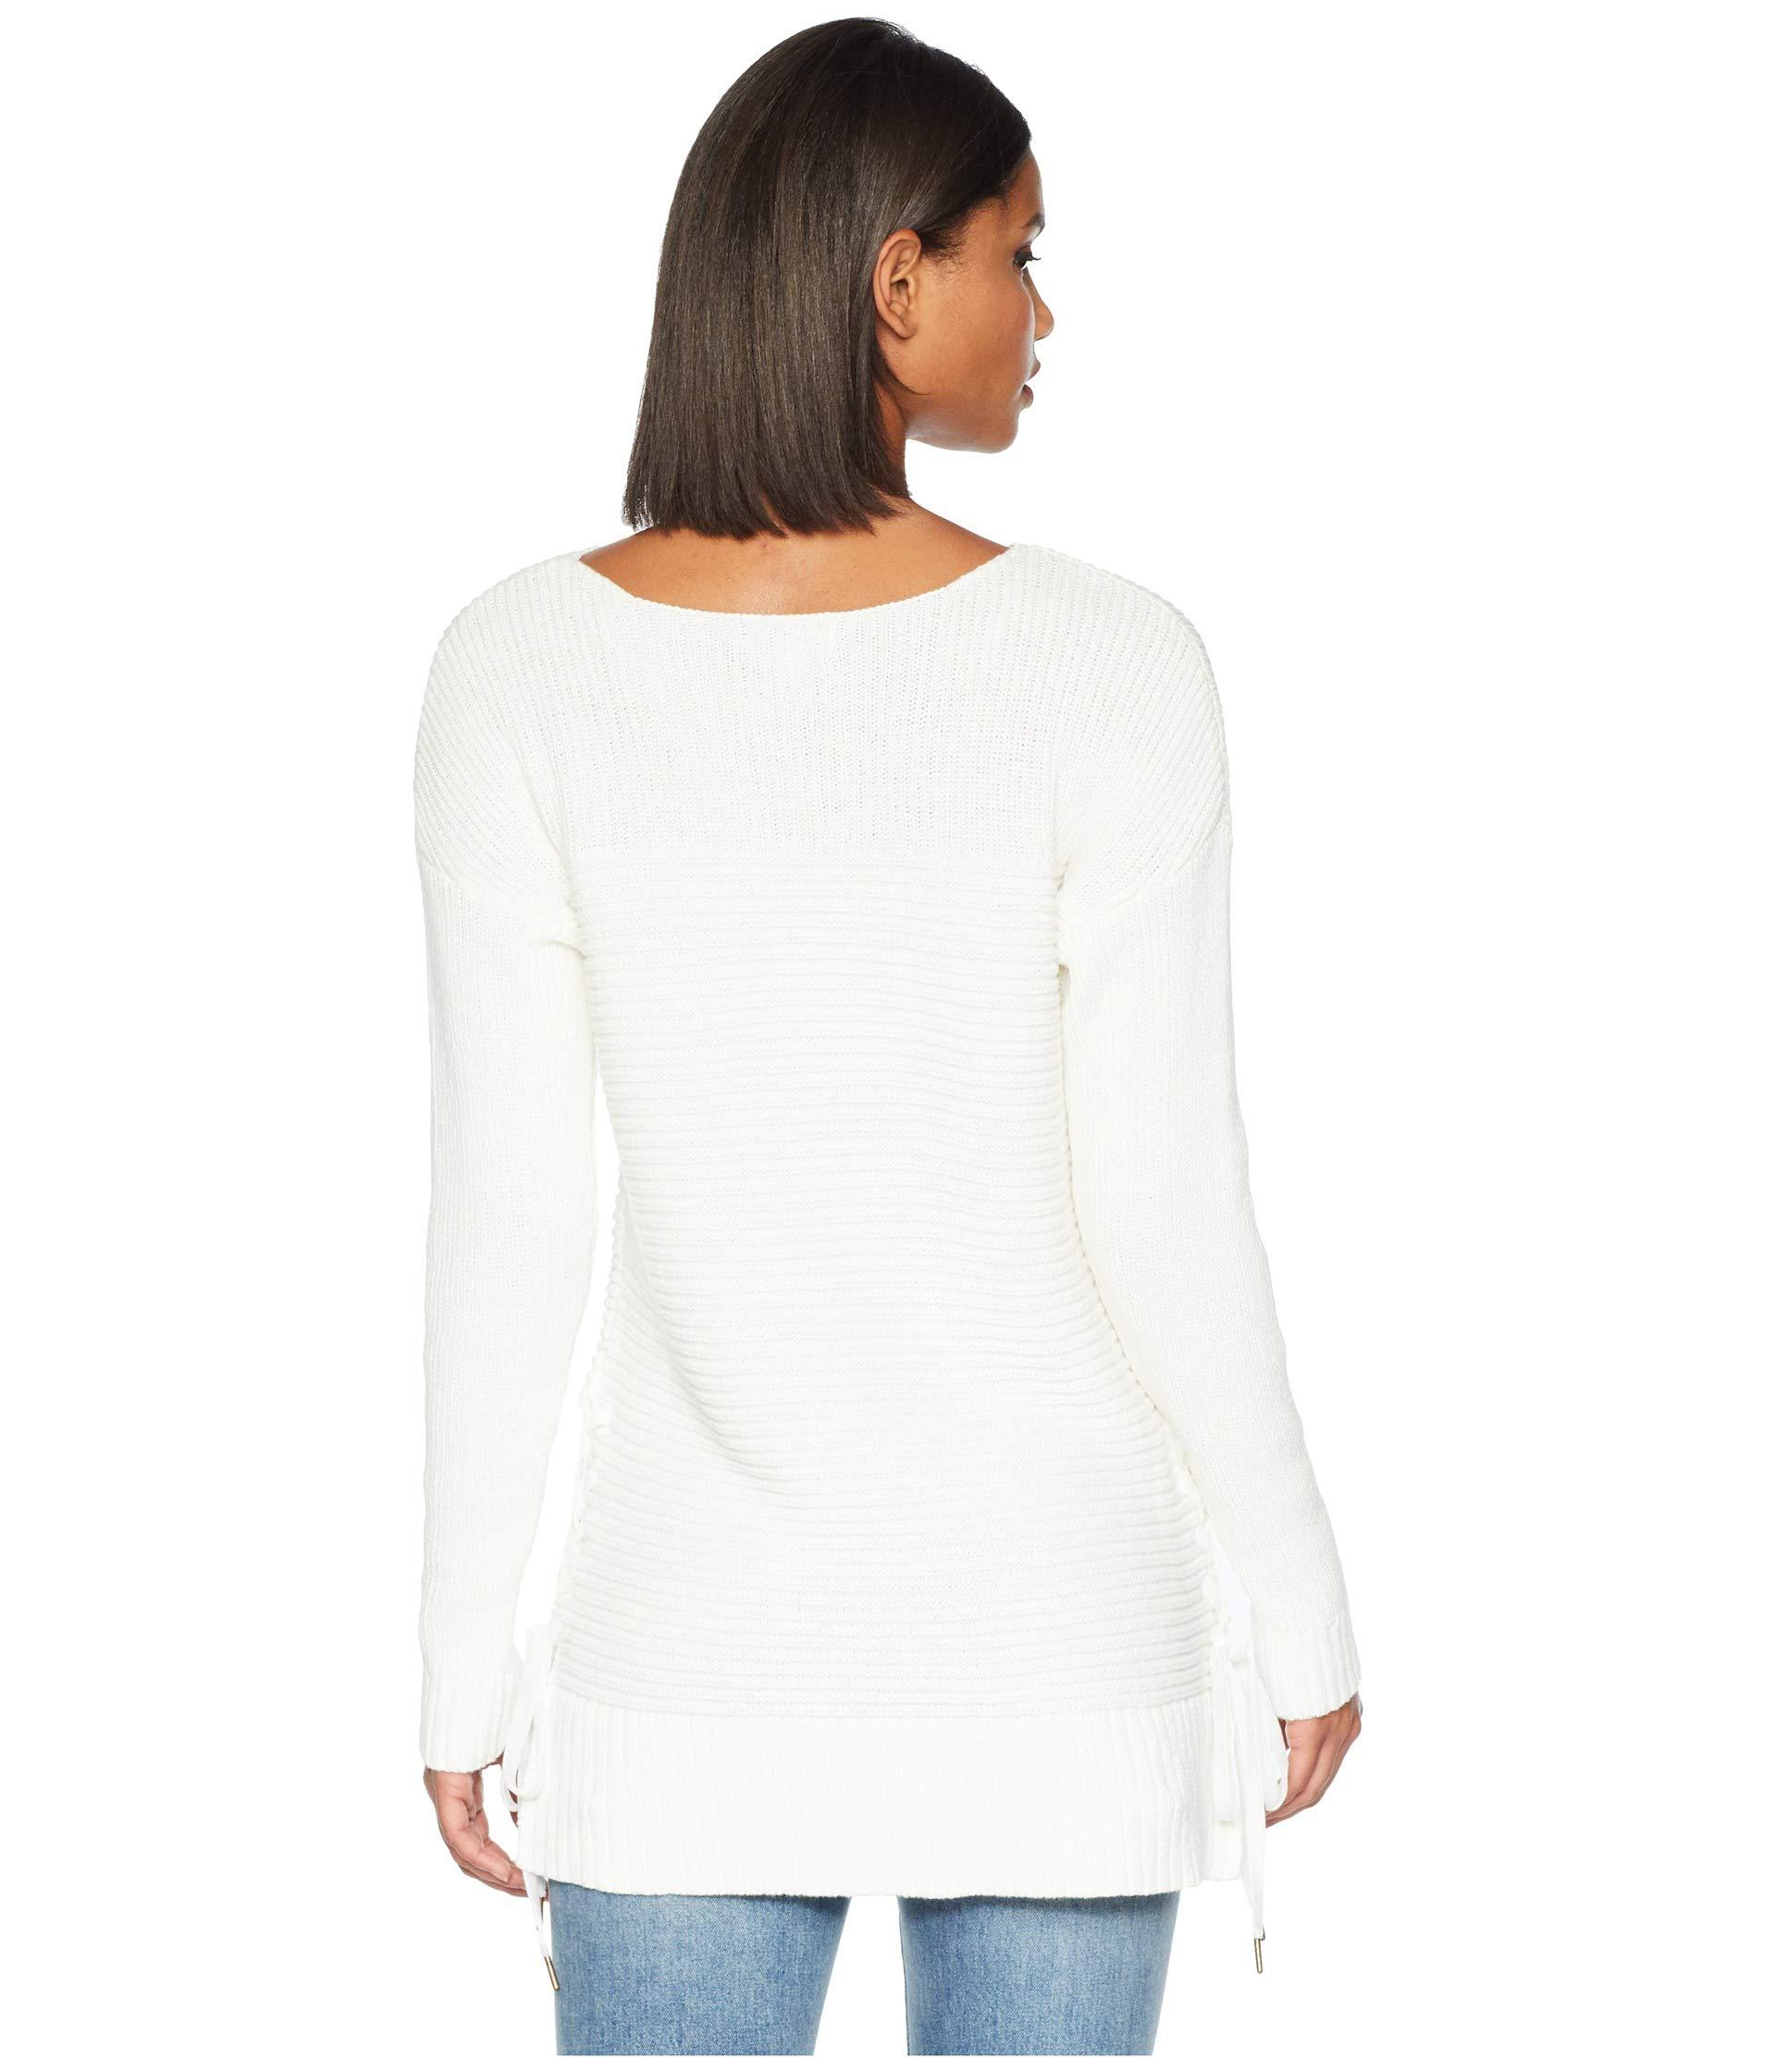 Kensie Ks0k5821 Cotton Yarn Tube Combo Sweater Ivory Cloud AwFpBvAqx